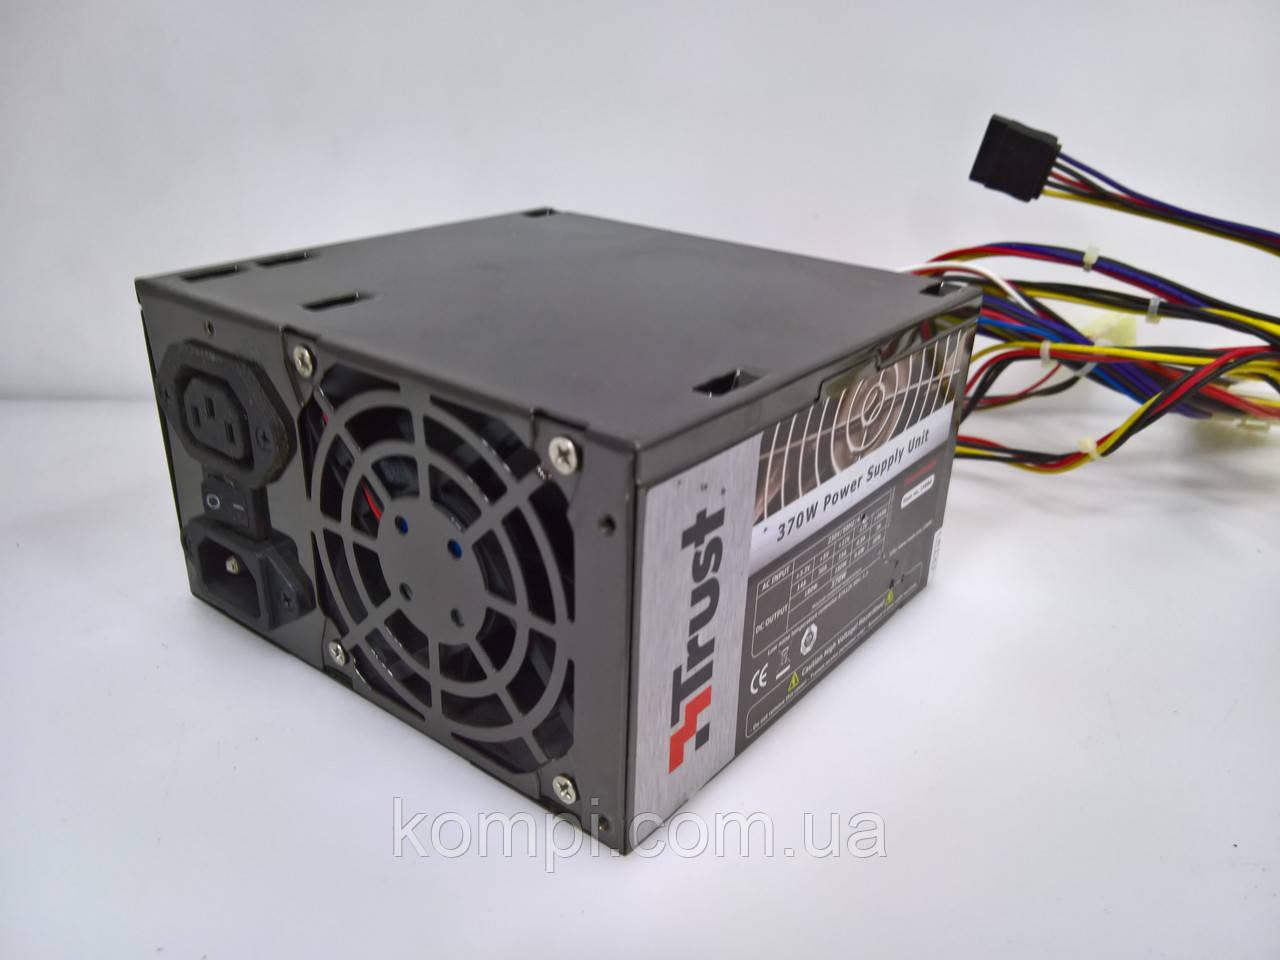 Блок питания 370W Trust Power Master 14886 б/у